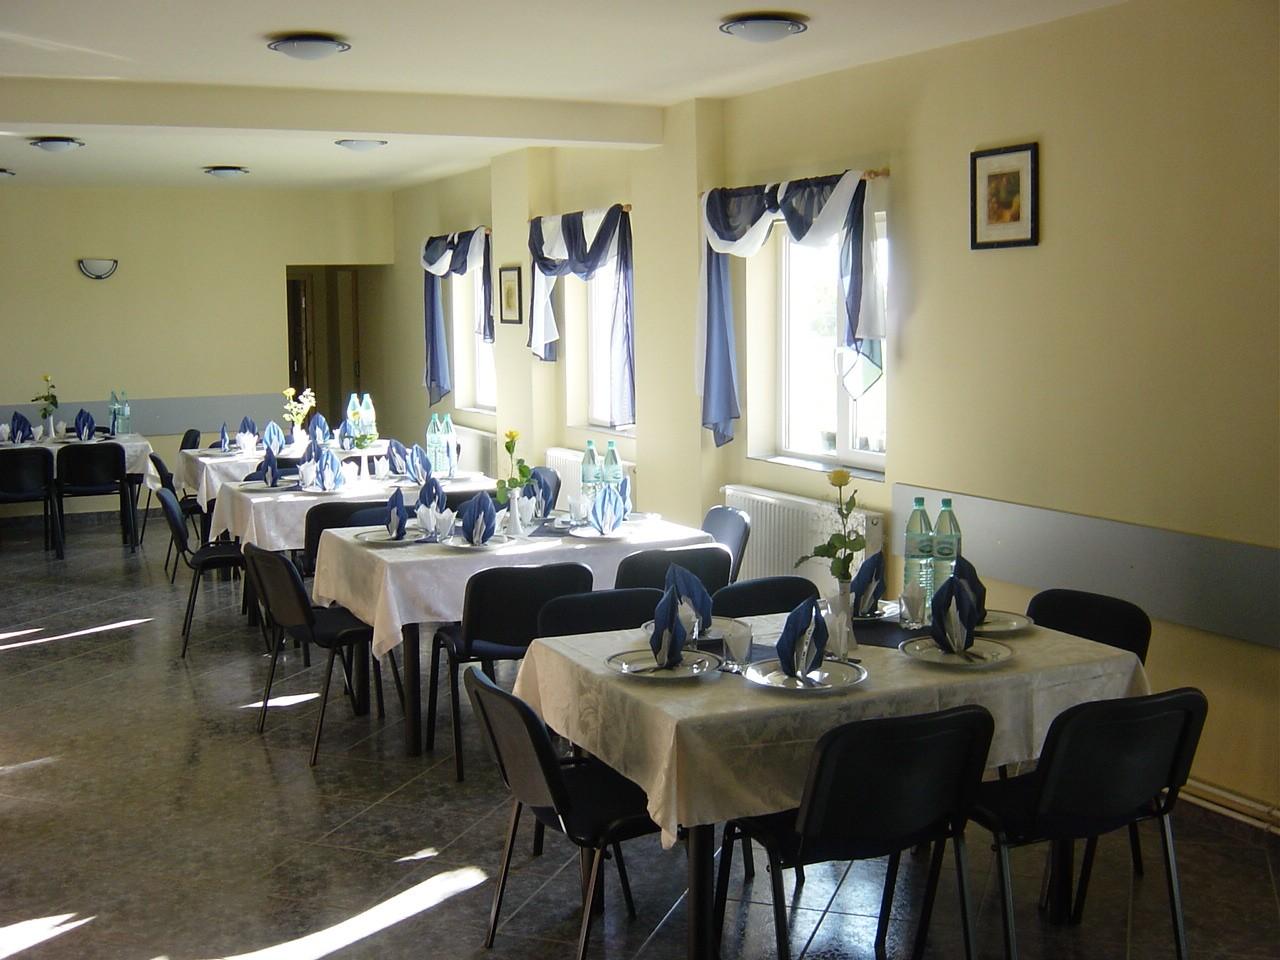 Mission Centre Dining Room